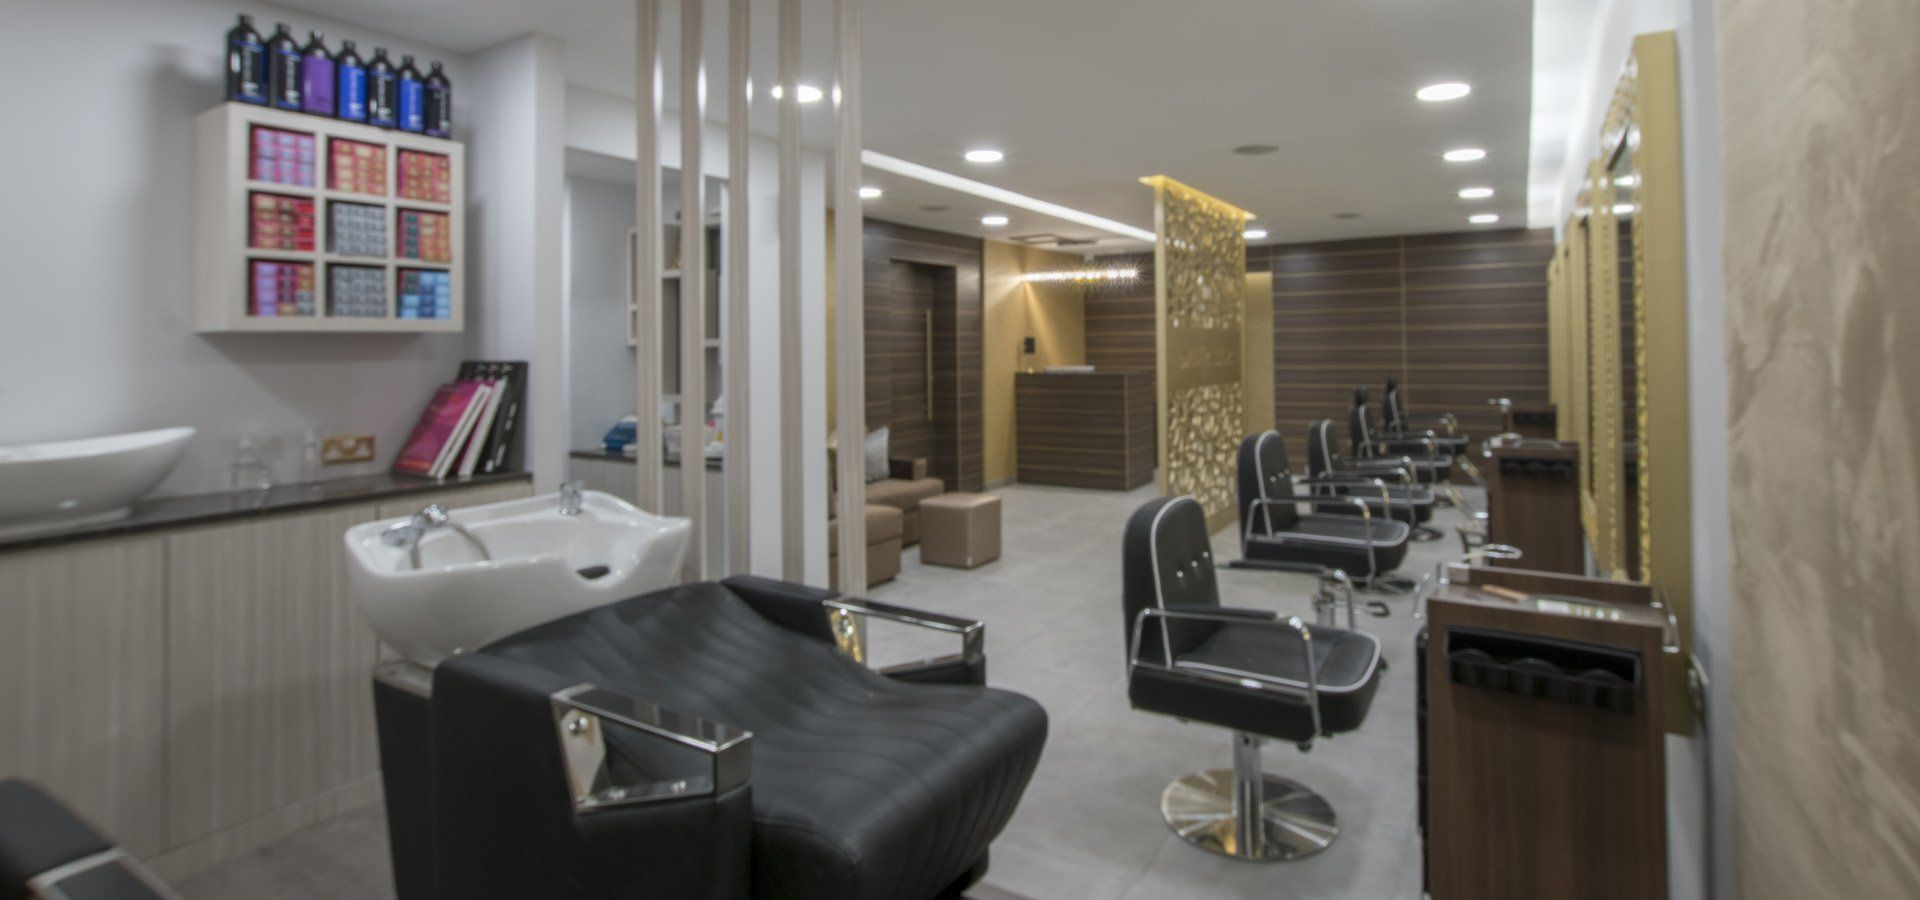 Indian Beauty Parlour Interior Design Images